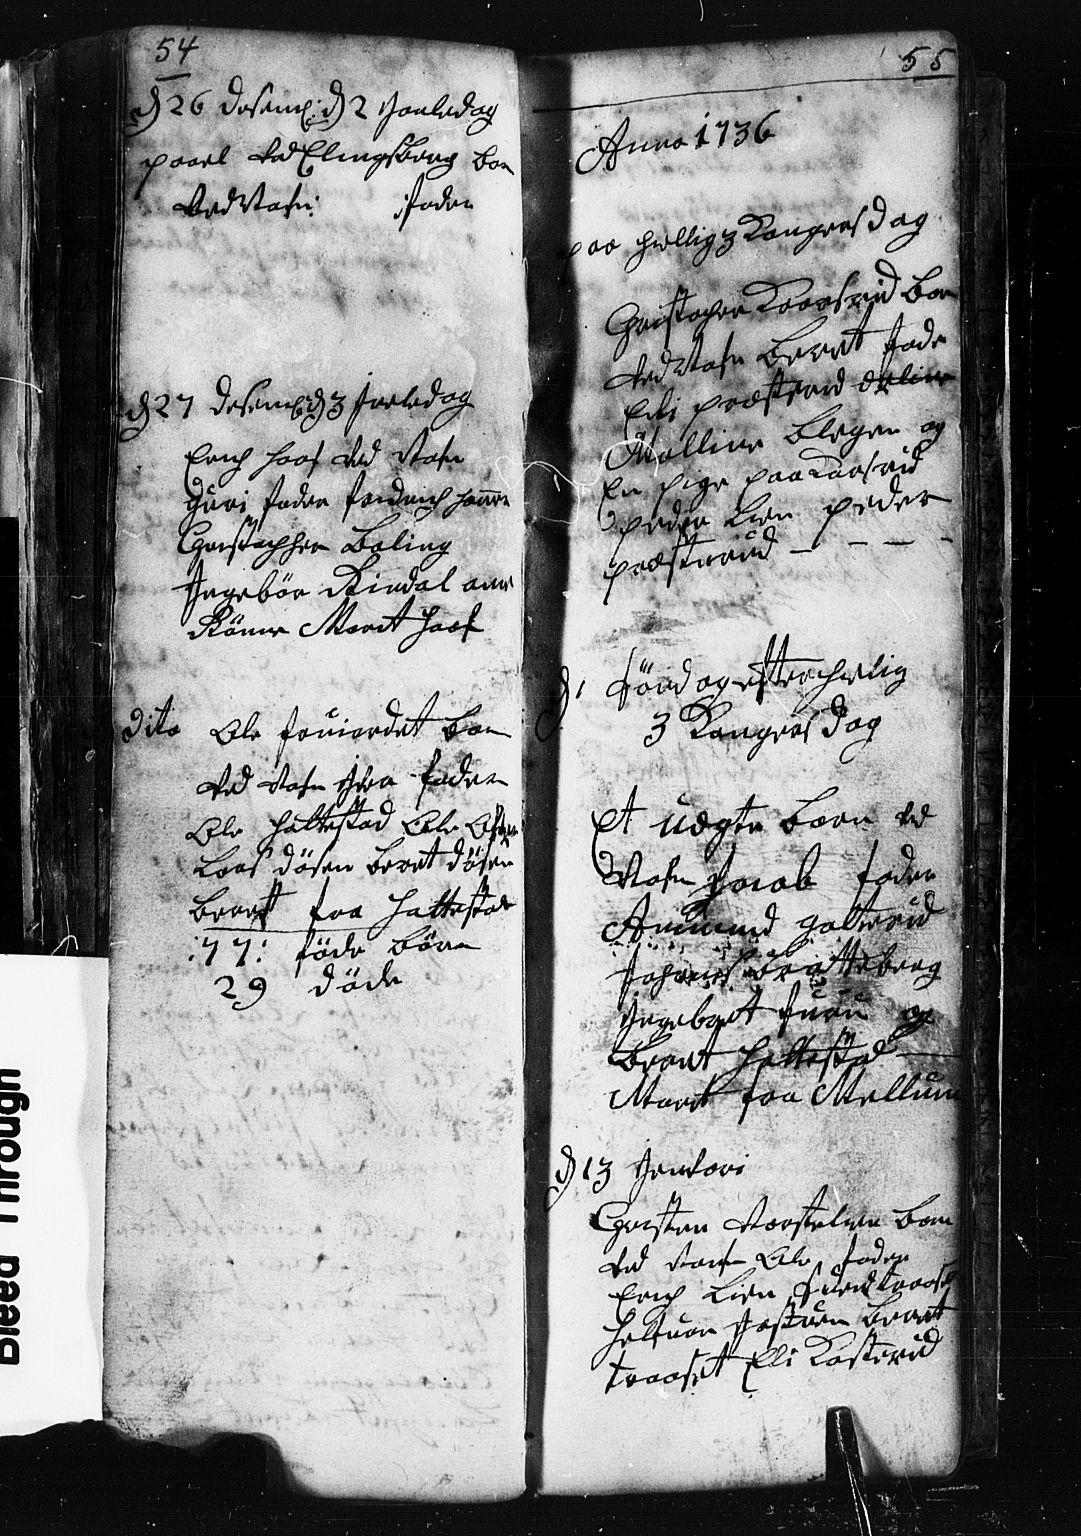 SAH, Fåberg prestekontor, Klokkerbok nr. 1, 1727-1767, s. 54-55